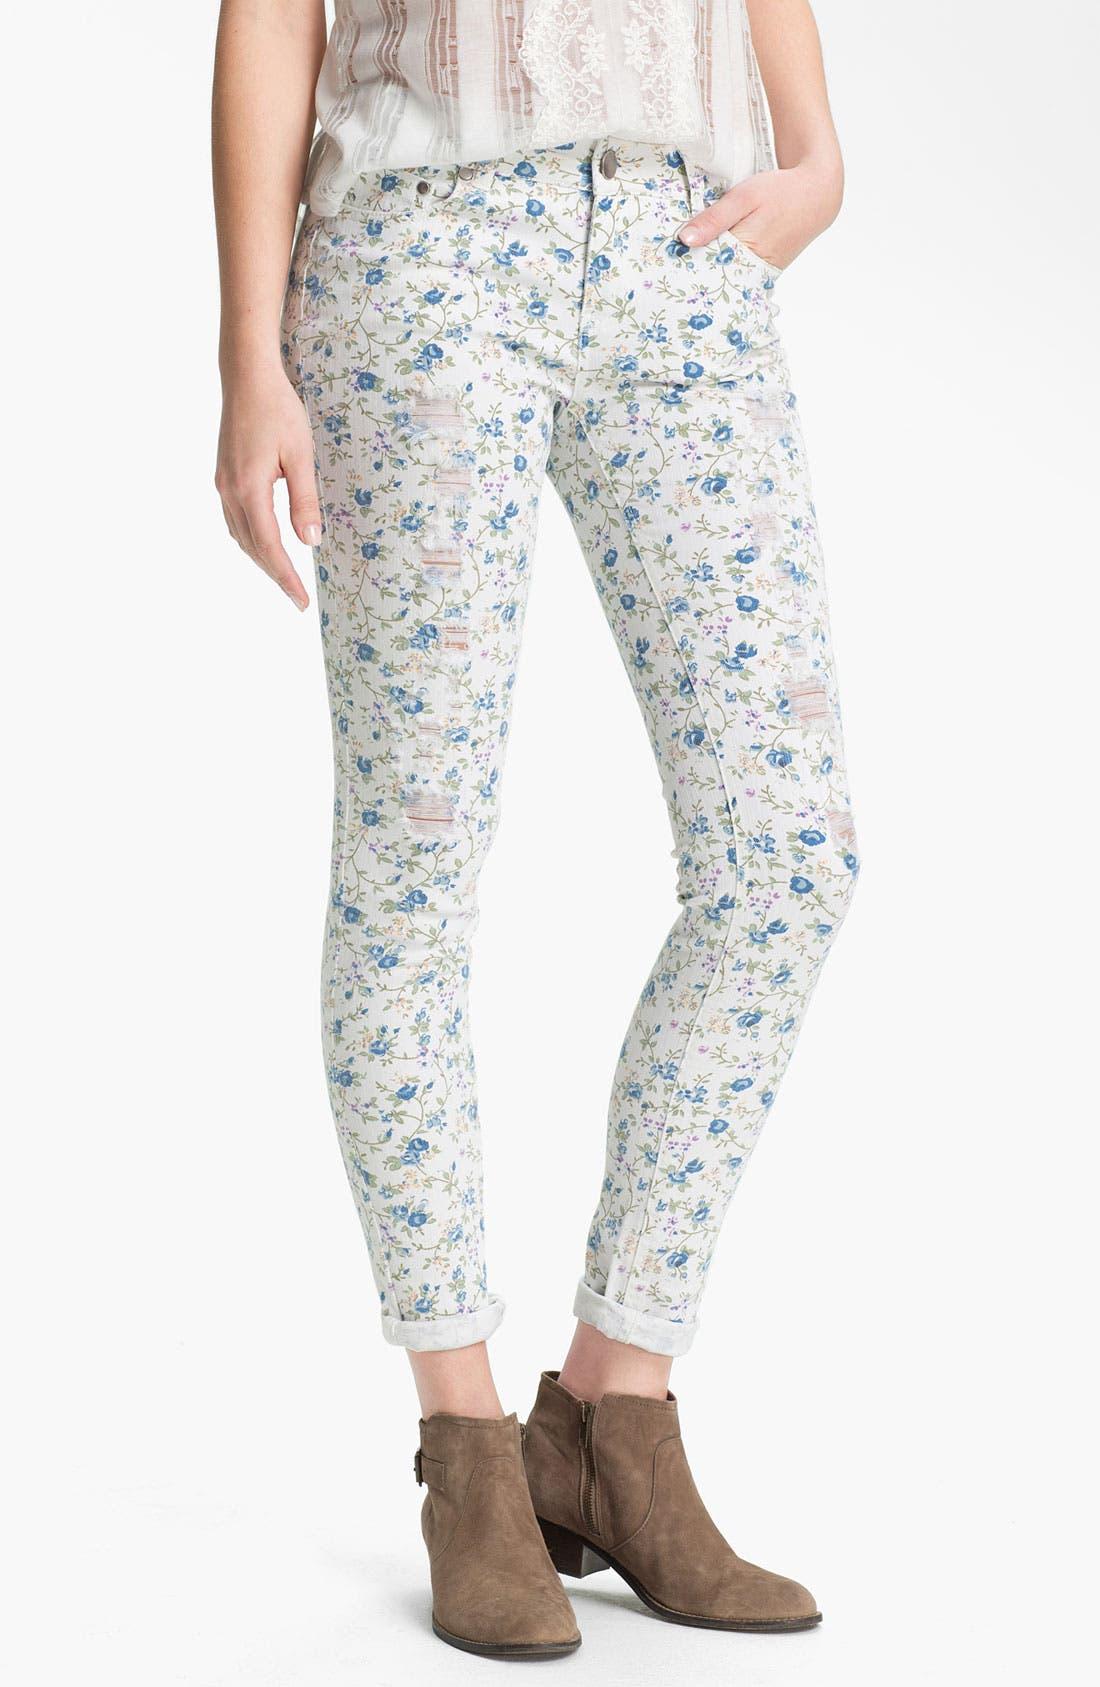 Alternate Image 1 Selected - Fire Floral Print Destroyed Skinny Jeans (Juniors)